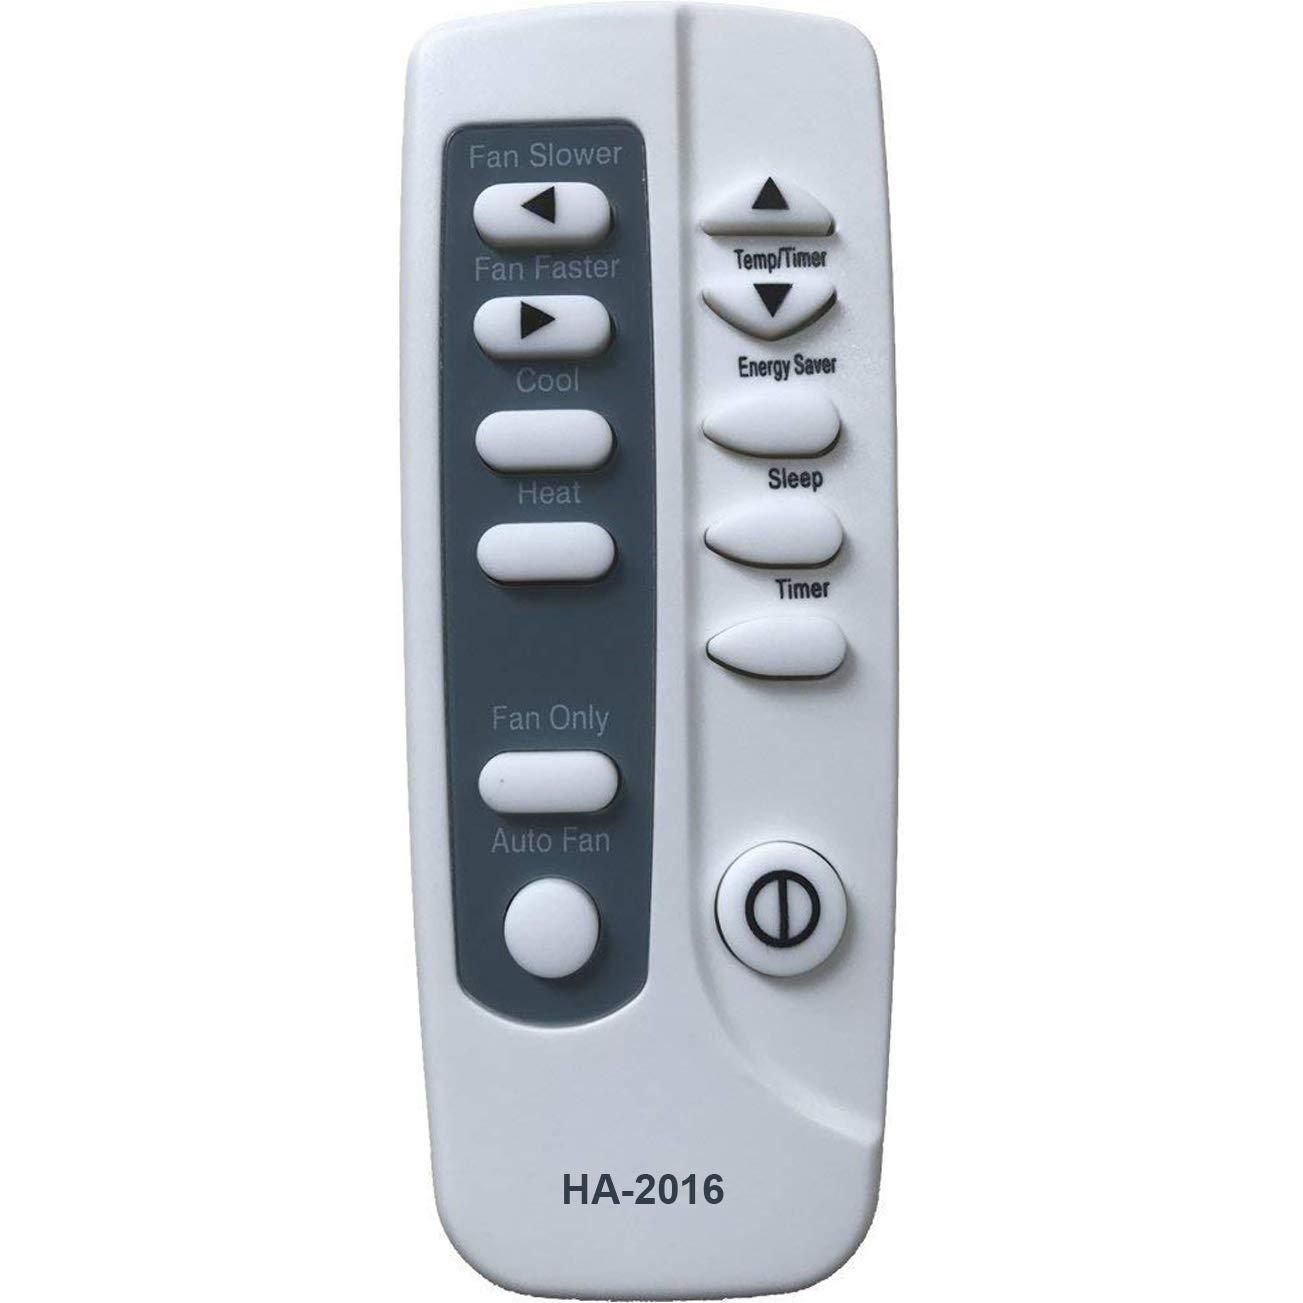 HA-2016 Replaces Frigidaire Air Conditioner Remote Control YN1G2 5304459455 5304459995 5304465361 works FAZ08HS1A13 FAZ08HS1A14 FAZ08HS1A15 FAZ08HS1A16 FAZ12HR2A FAZ12HR2A2 Home Appliances Inc Of ShenZhen Air conditioner Parts